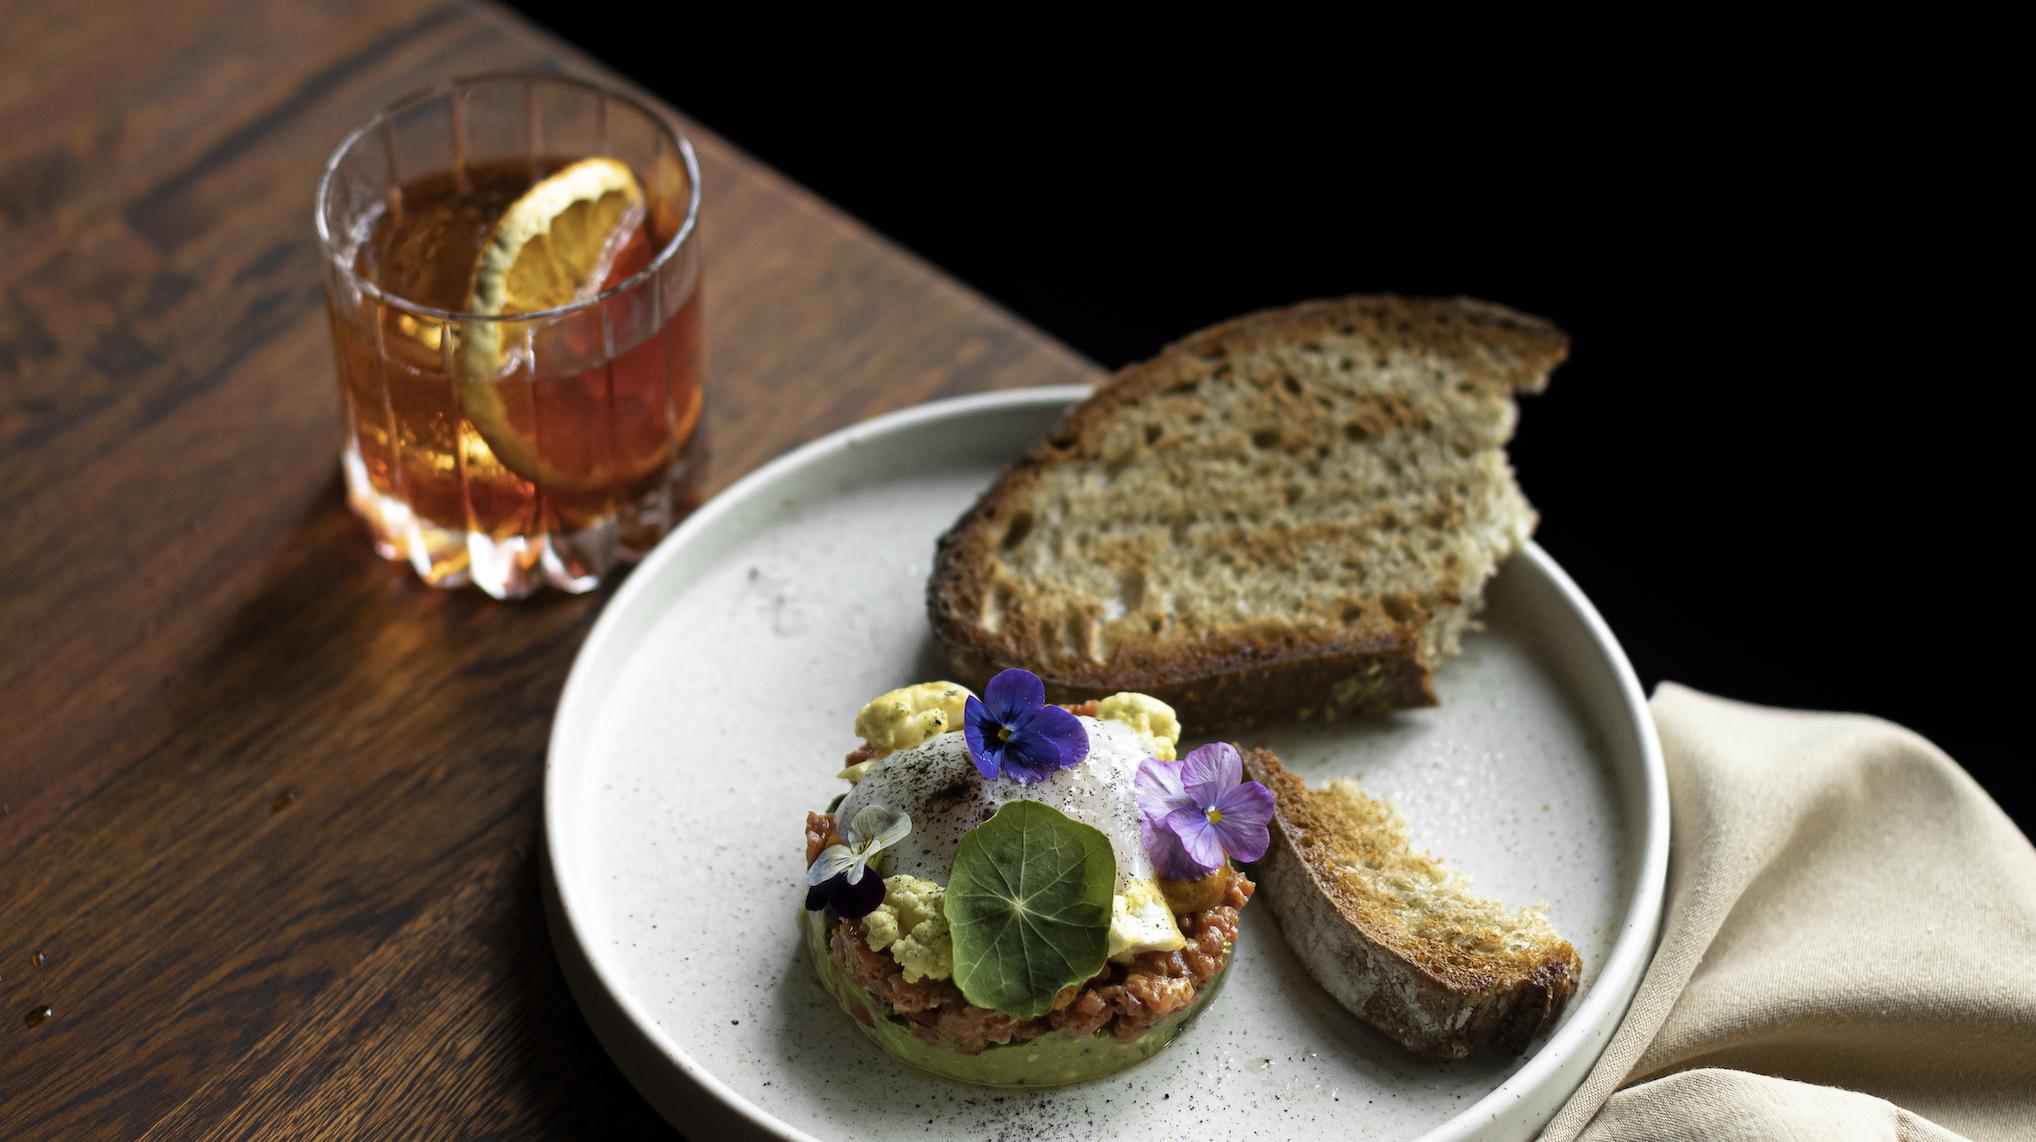 Carlos Gaytán's comeback restaurant is bold, heartfelt and downright delicious